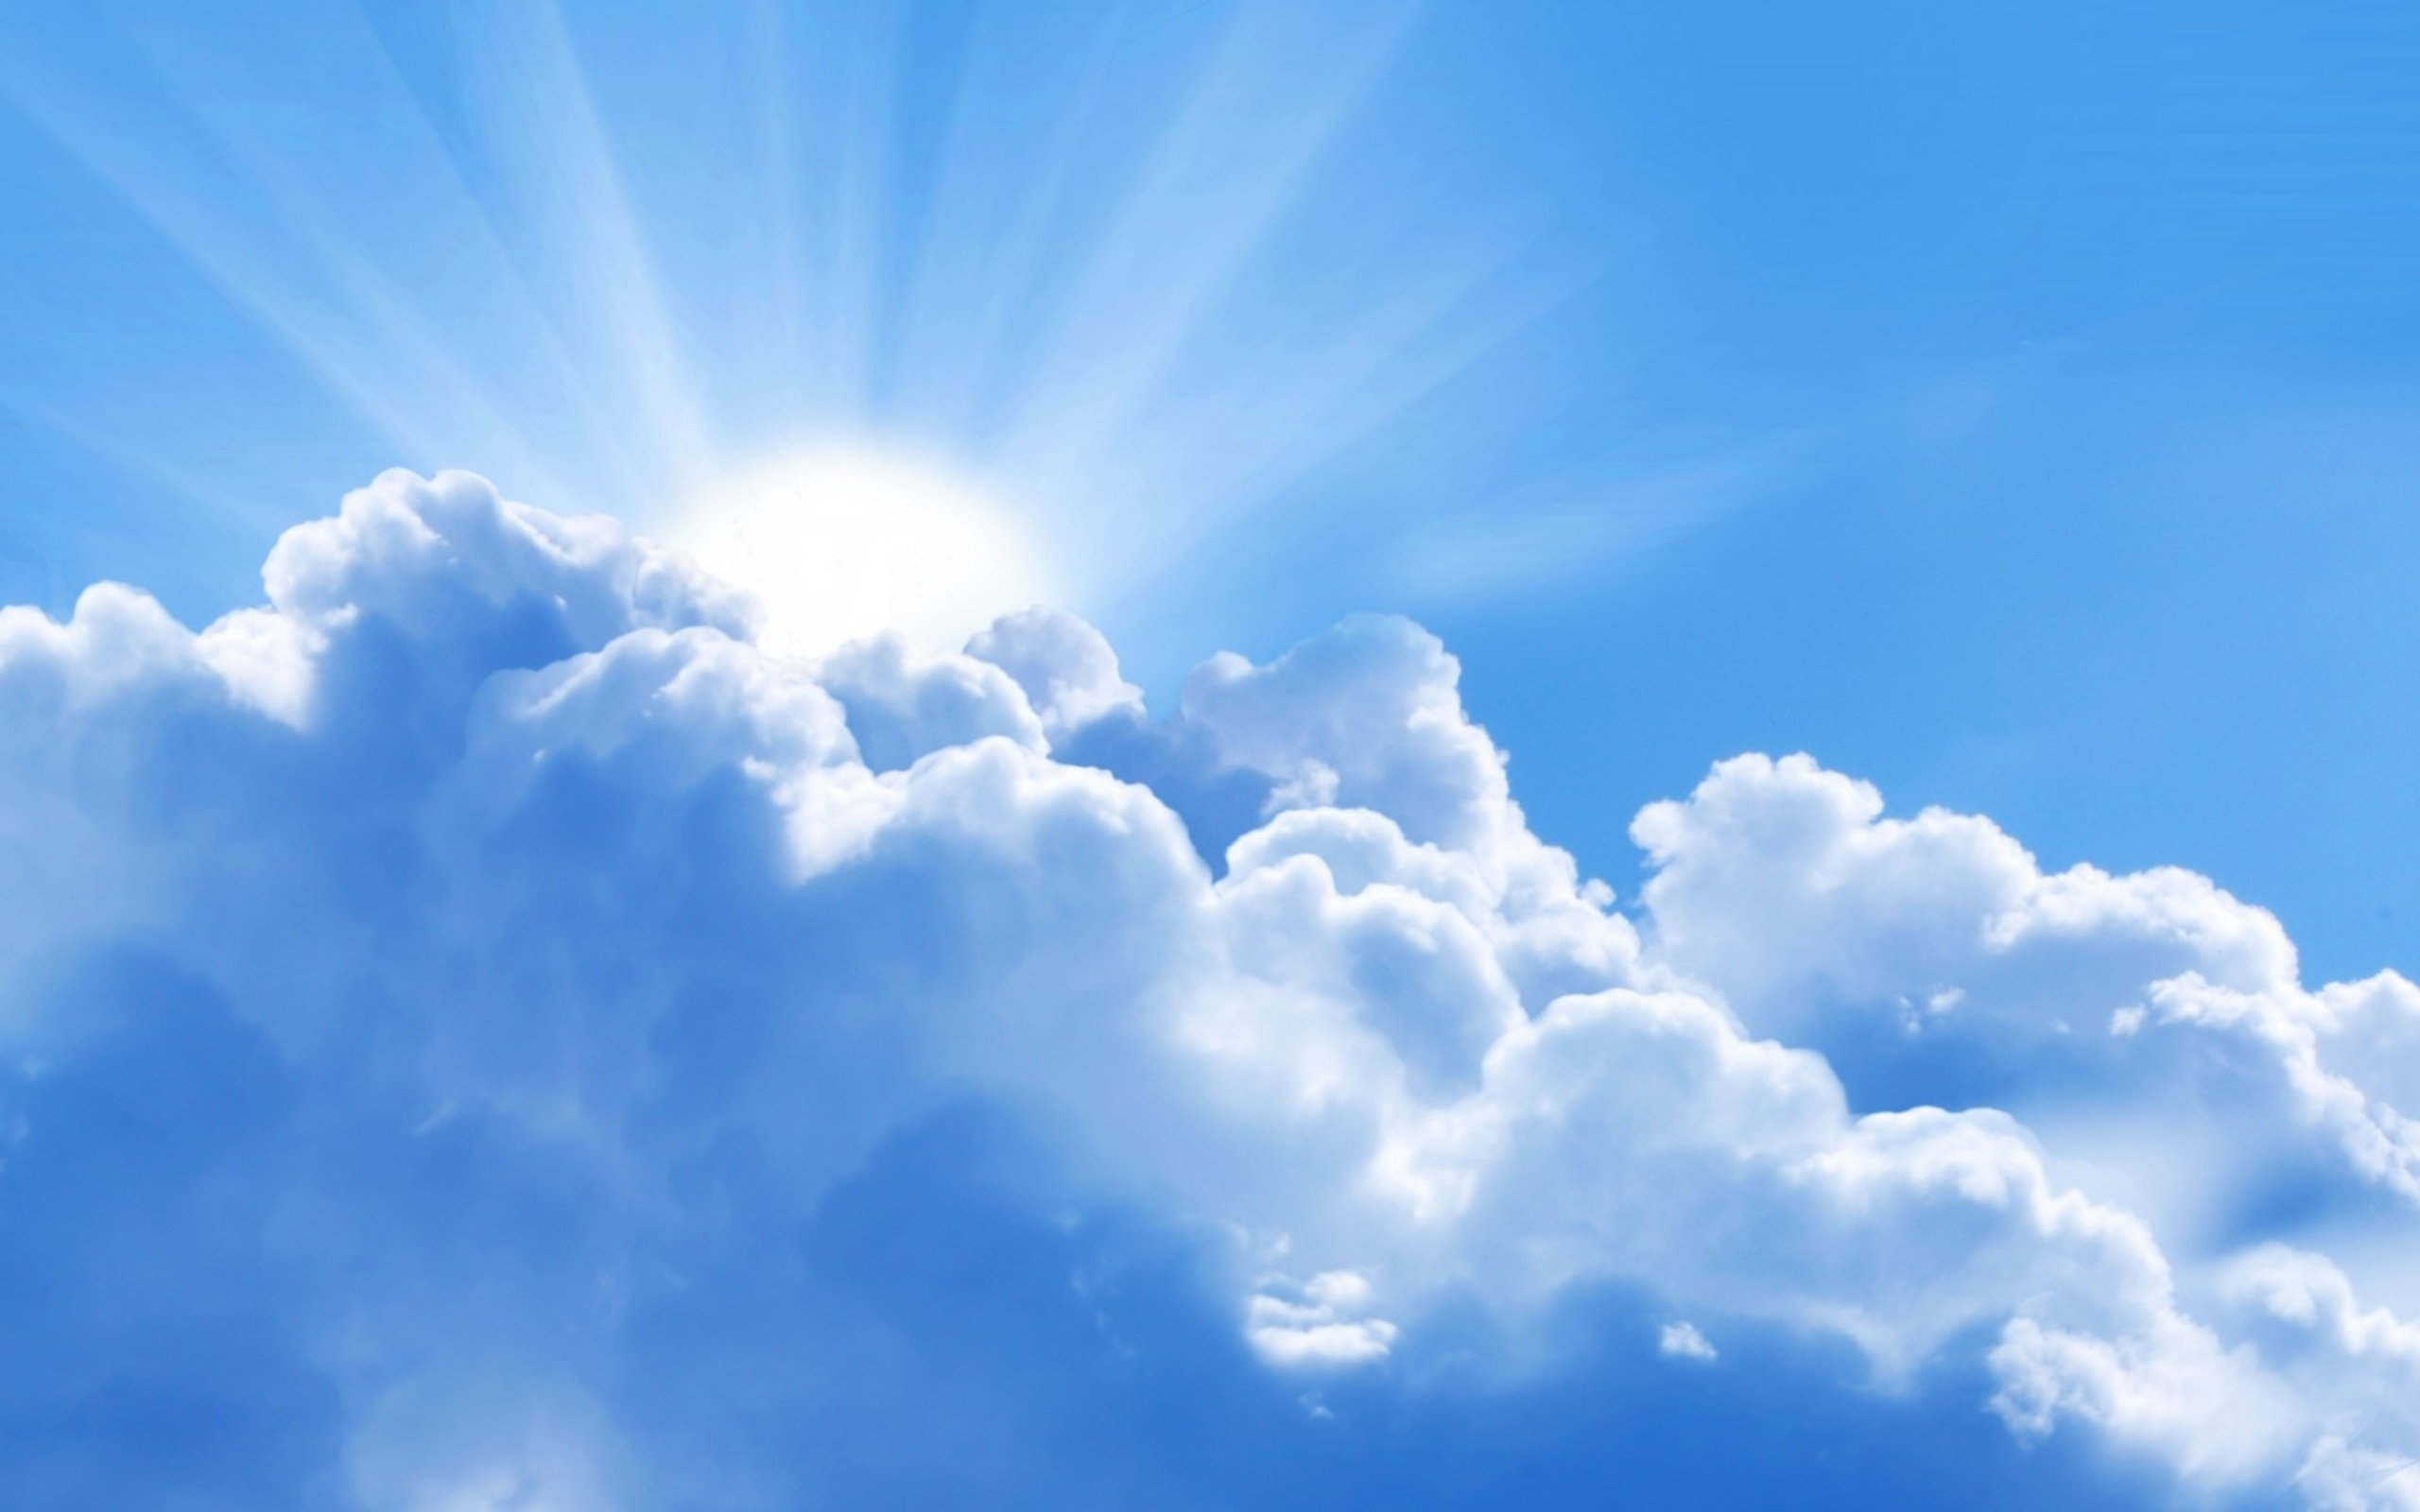 Cloud Wallpaper HD Background Freetopwallpapercom 2560x1600